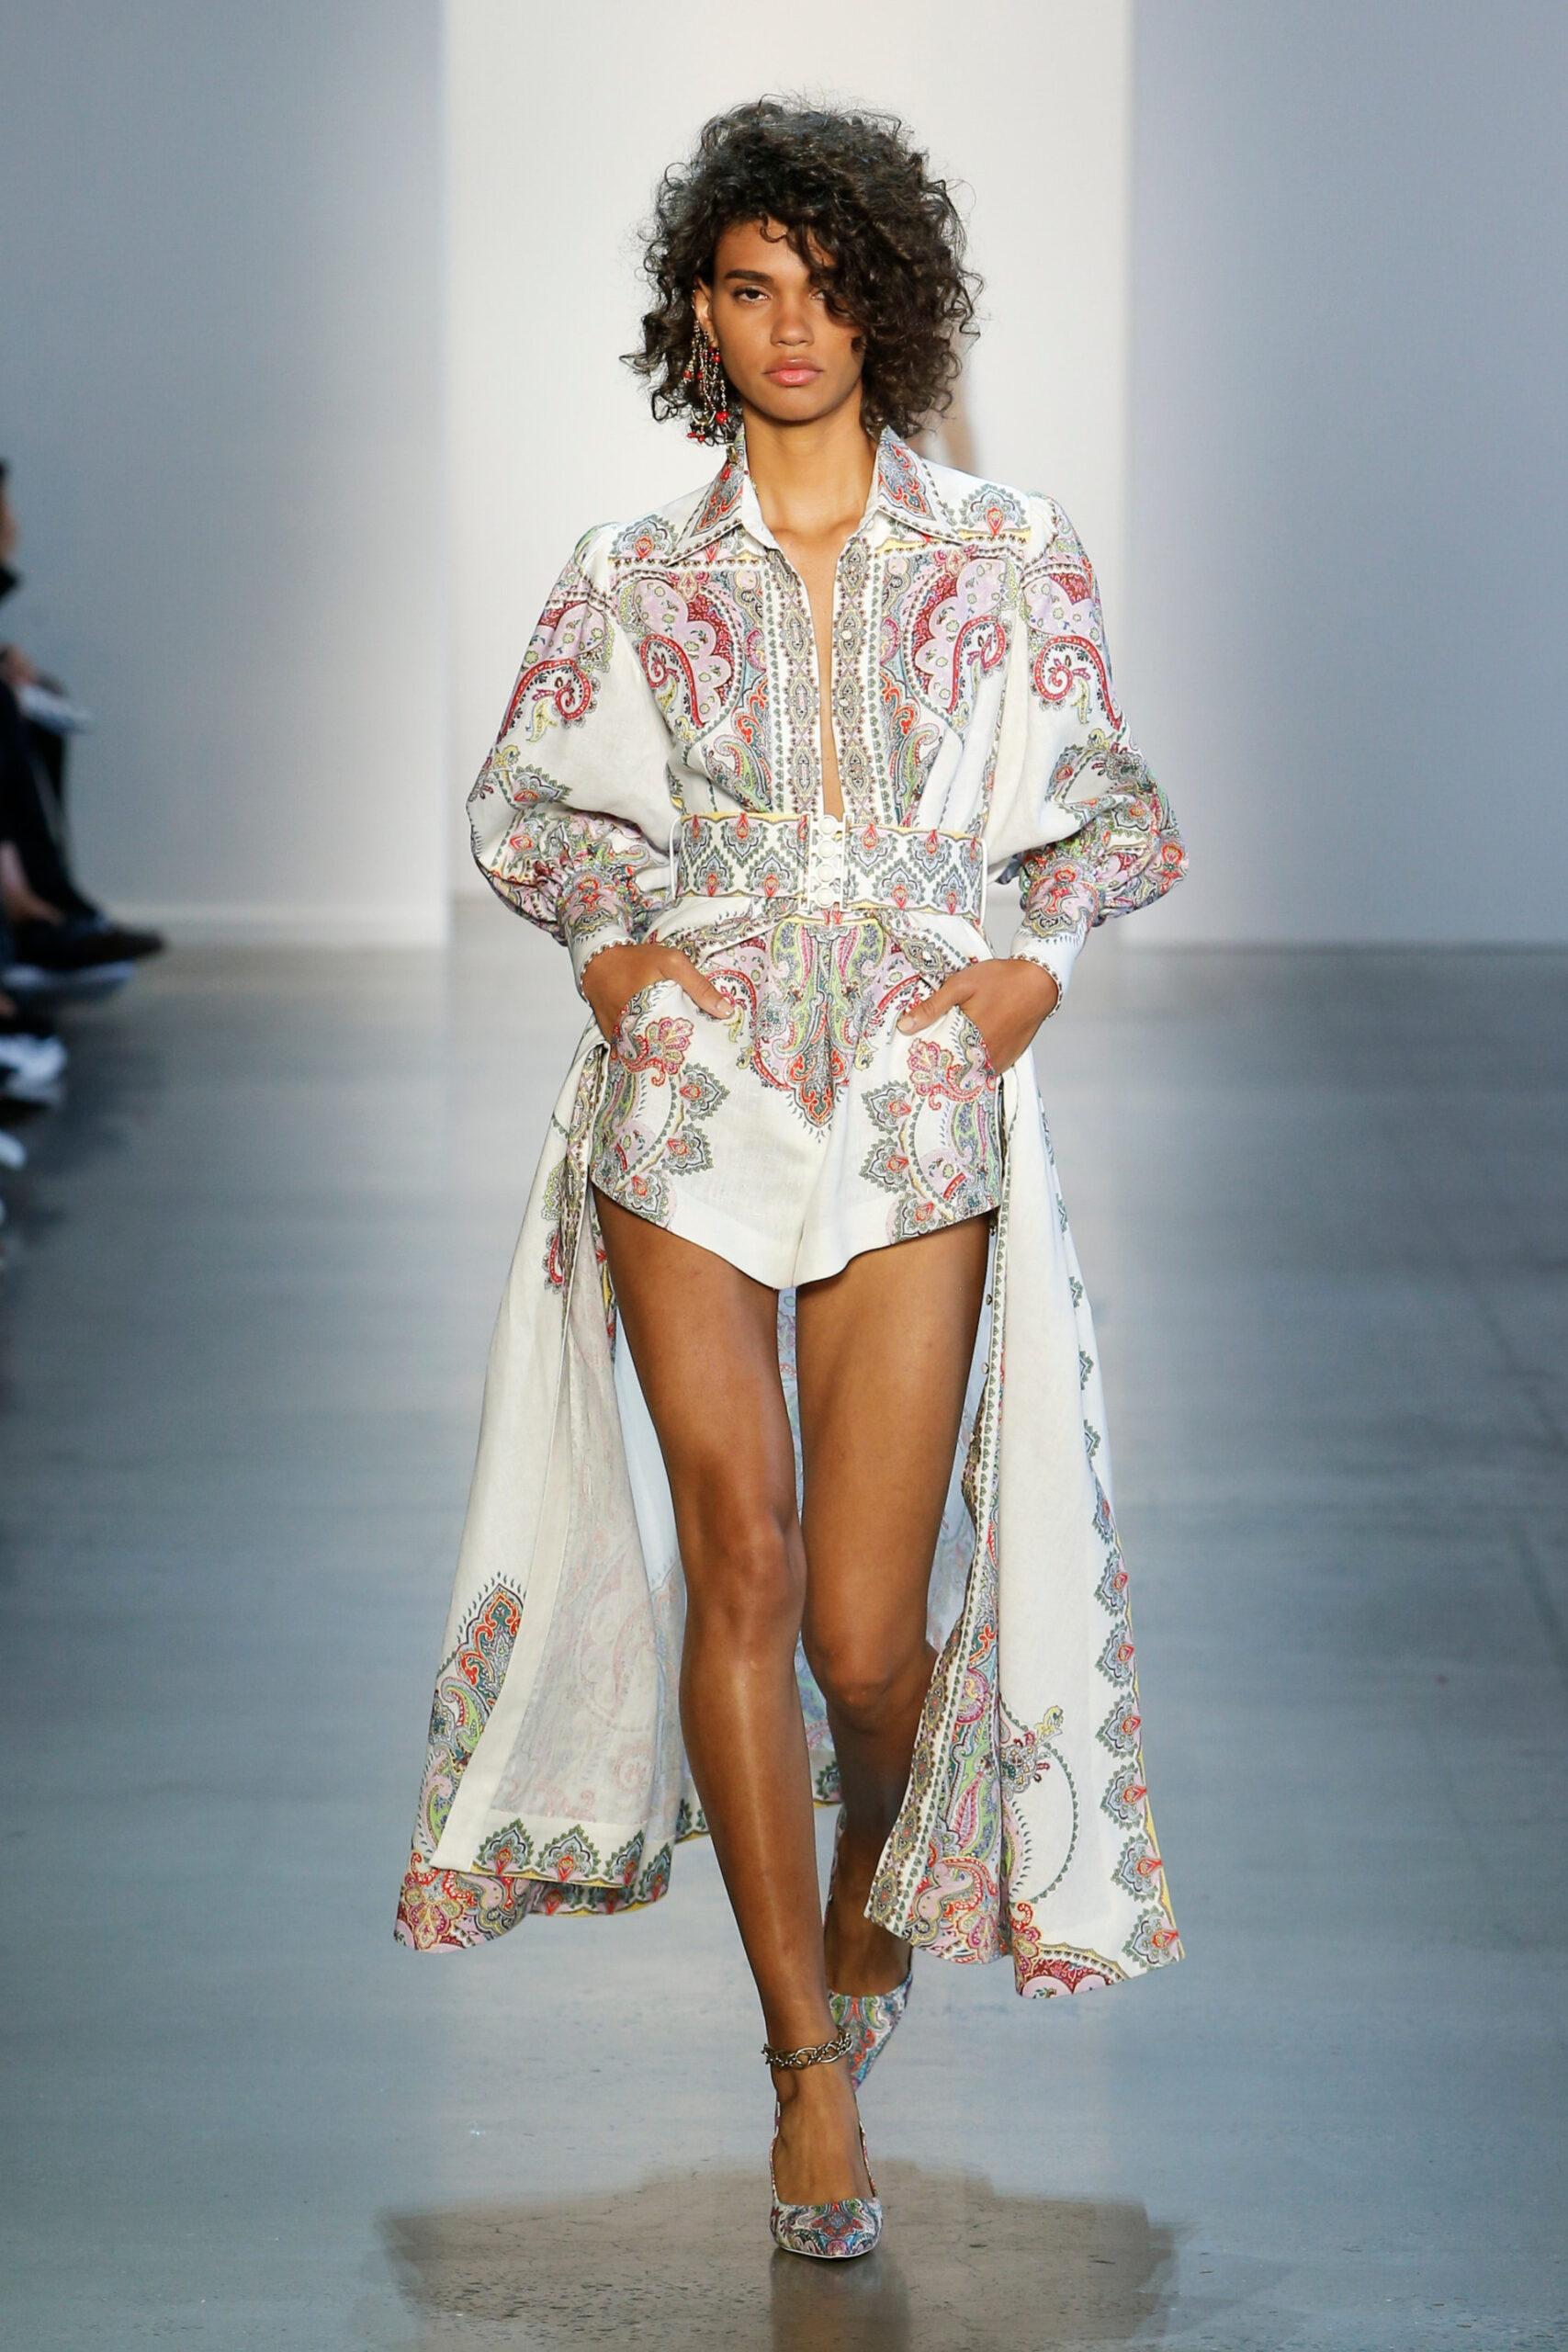 Barbara Valente, la nueva modelo brasileña